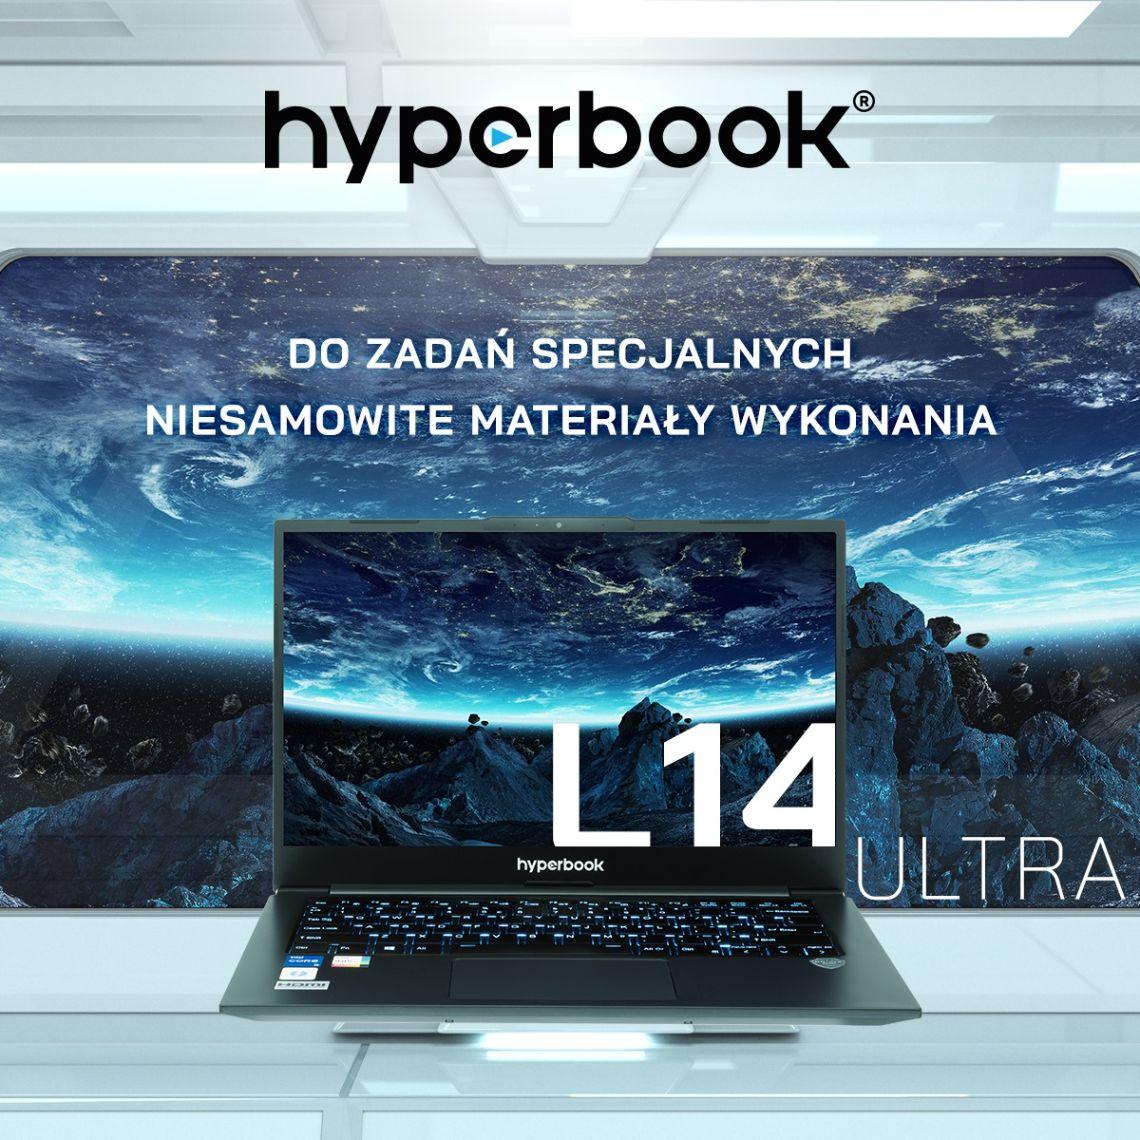 Hyperbook